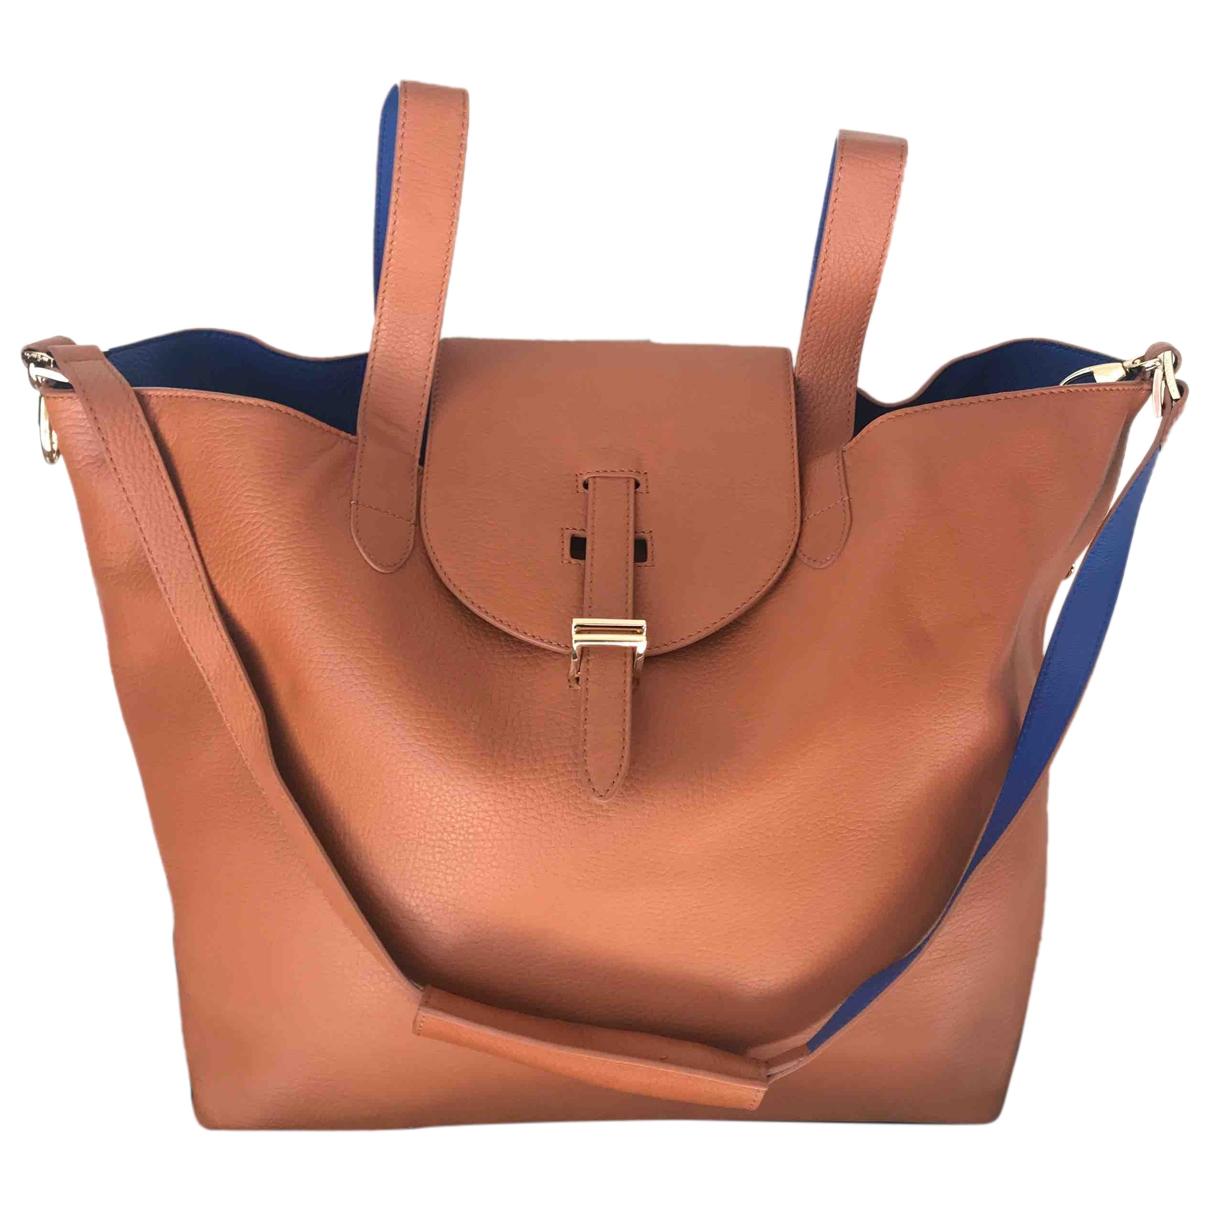 Meli Melo \N Handtasche in  Bunt Leder